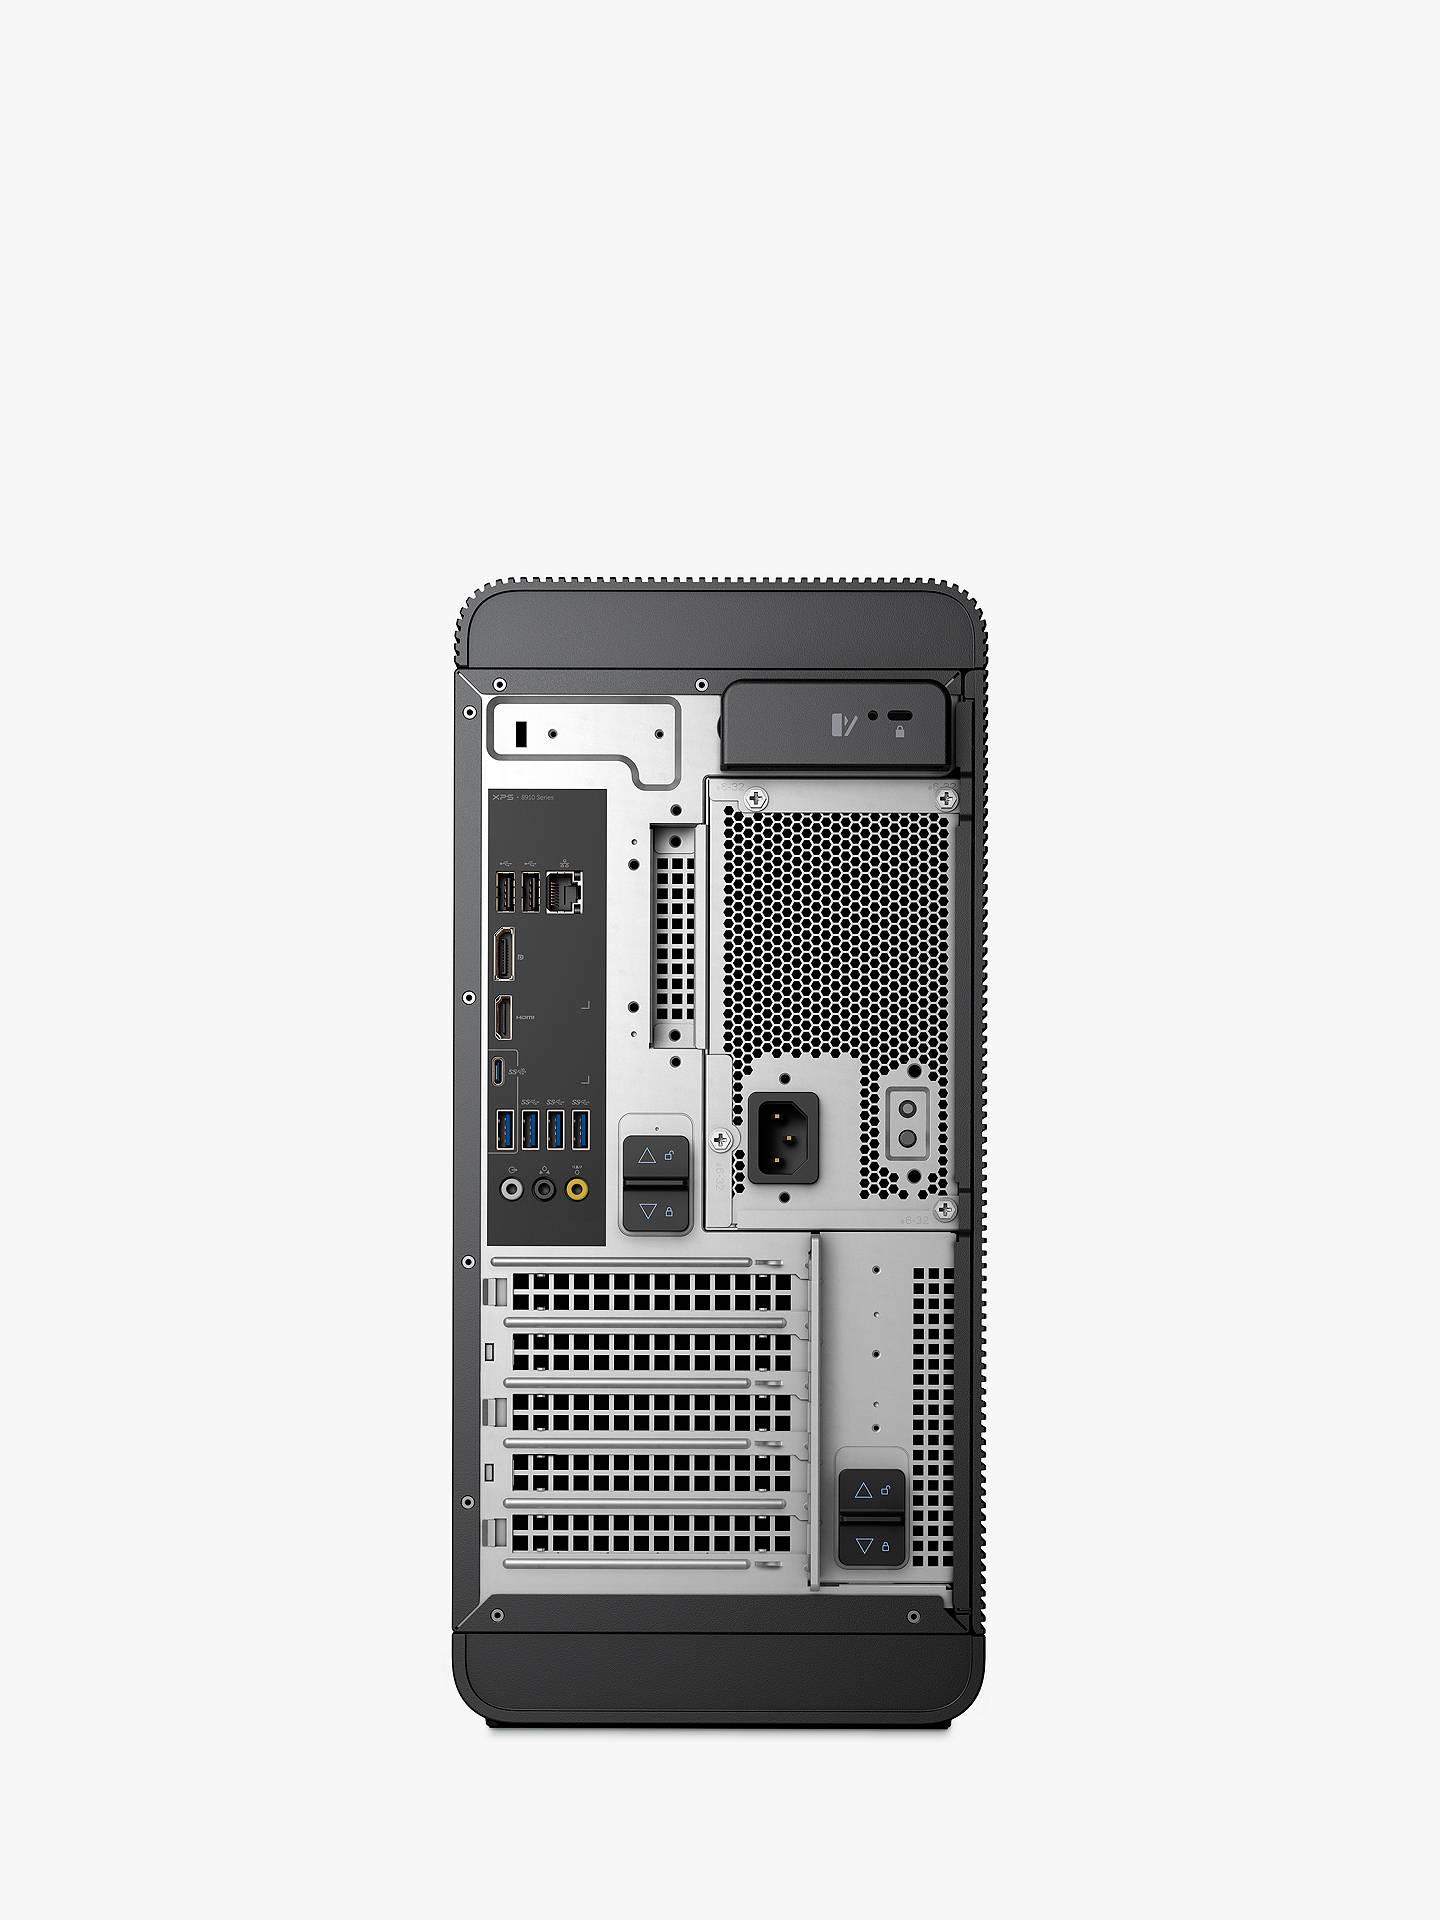 XPS 8900 Desktop, Intel Core i7, 8GB RAM, 1TB HDD + 16GB Intel Optane  Memory, Nvidia Geforce GTX 1060, Black